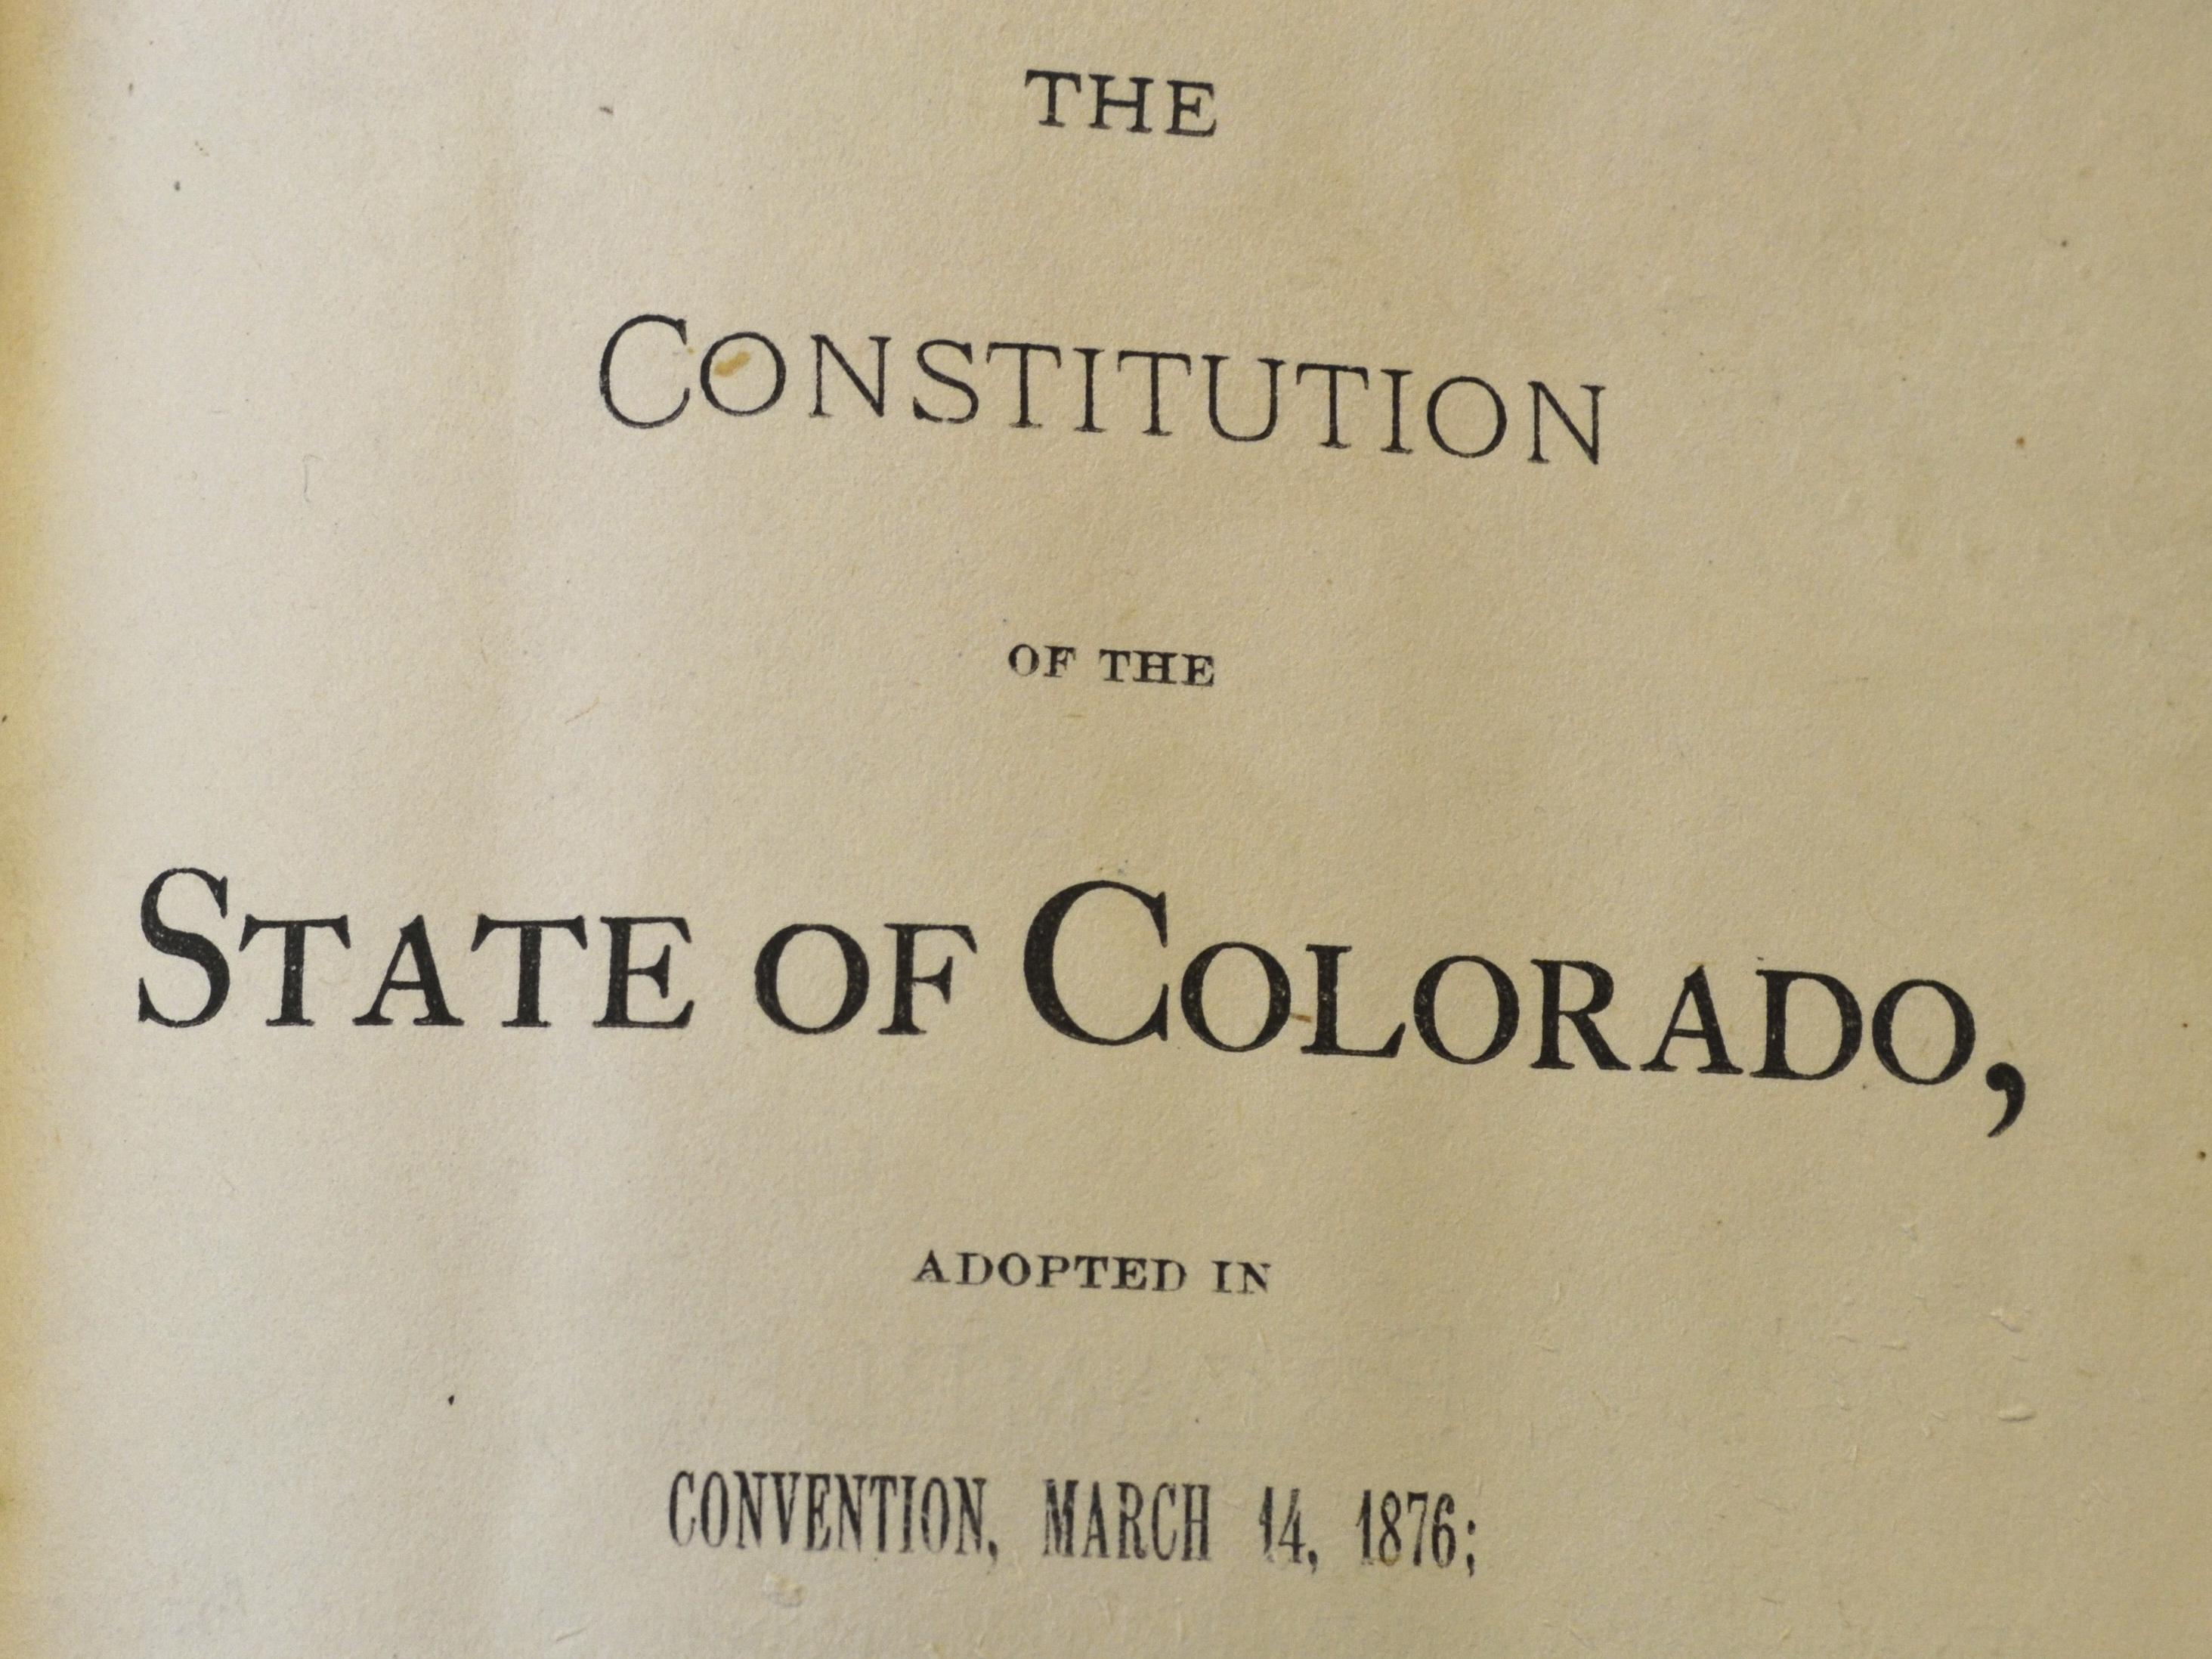 Colorado Votes To Abolish Slavery, 2 Years After Similar Amendment Failed